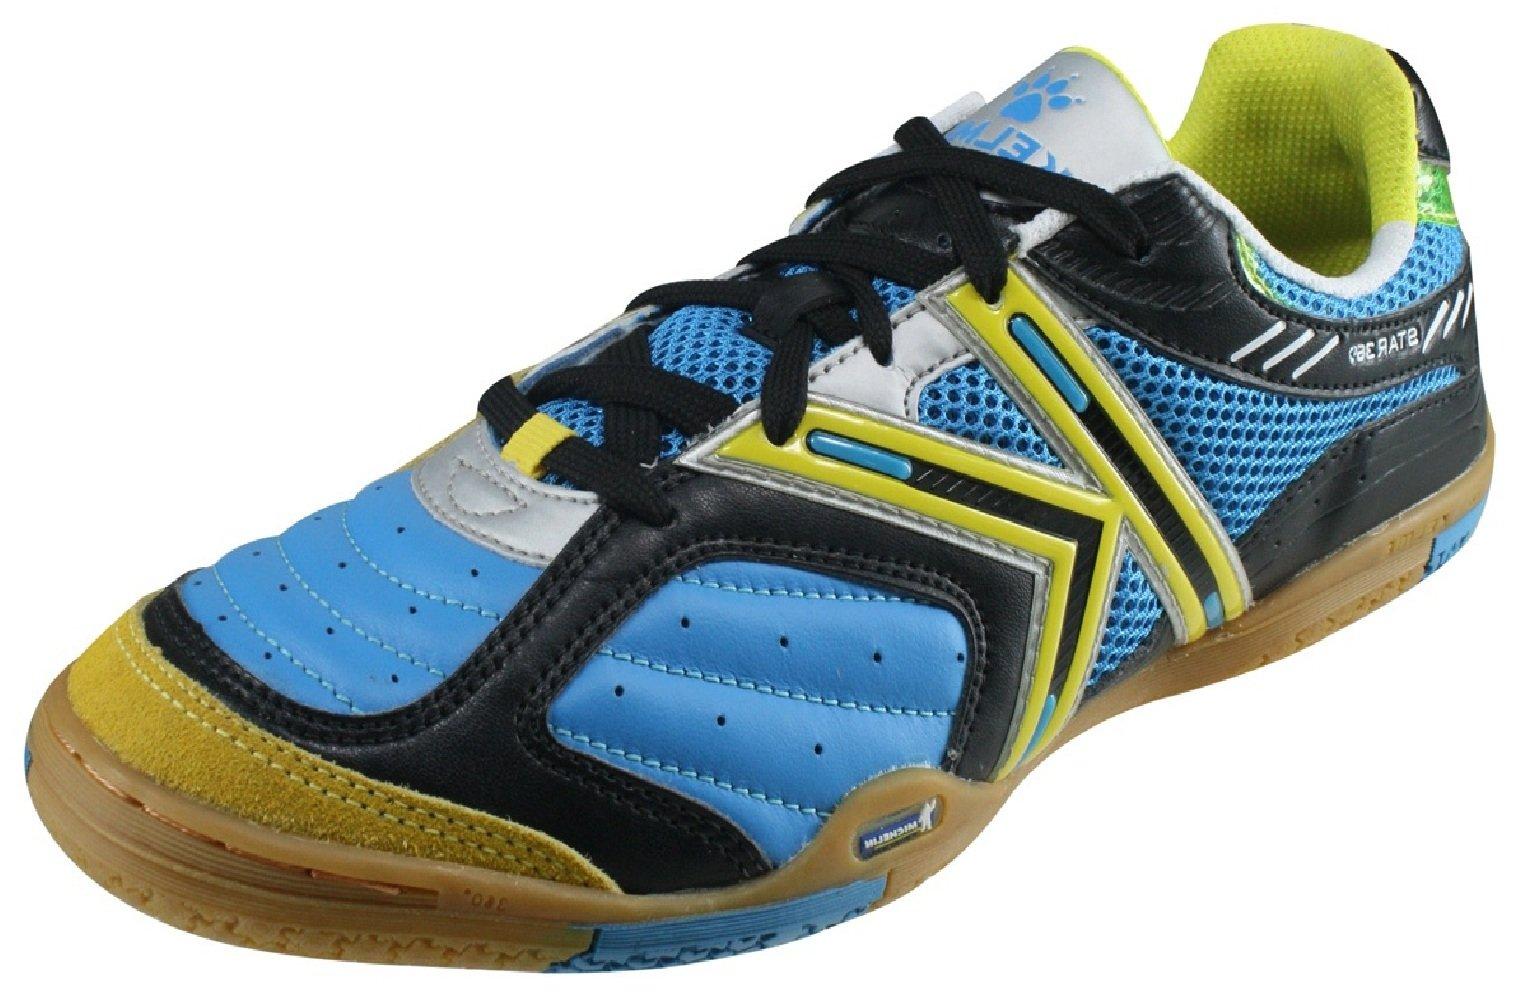 83ec25e549b Galleon - KELME Star 360 Mens Michelin Leather Mesh Inset Soccer Shoes  Turquoise